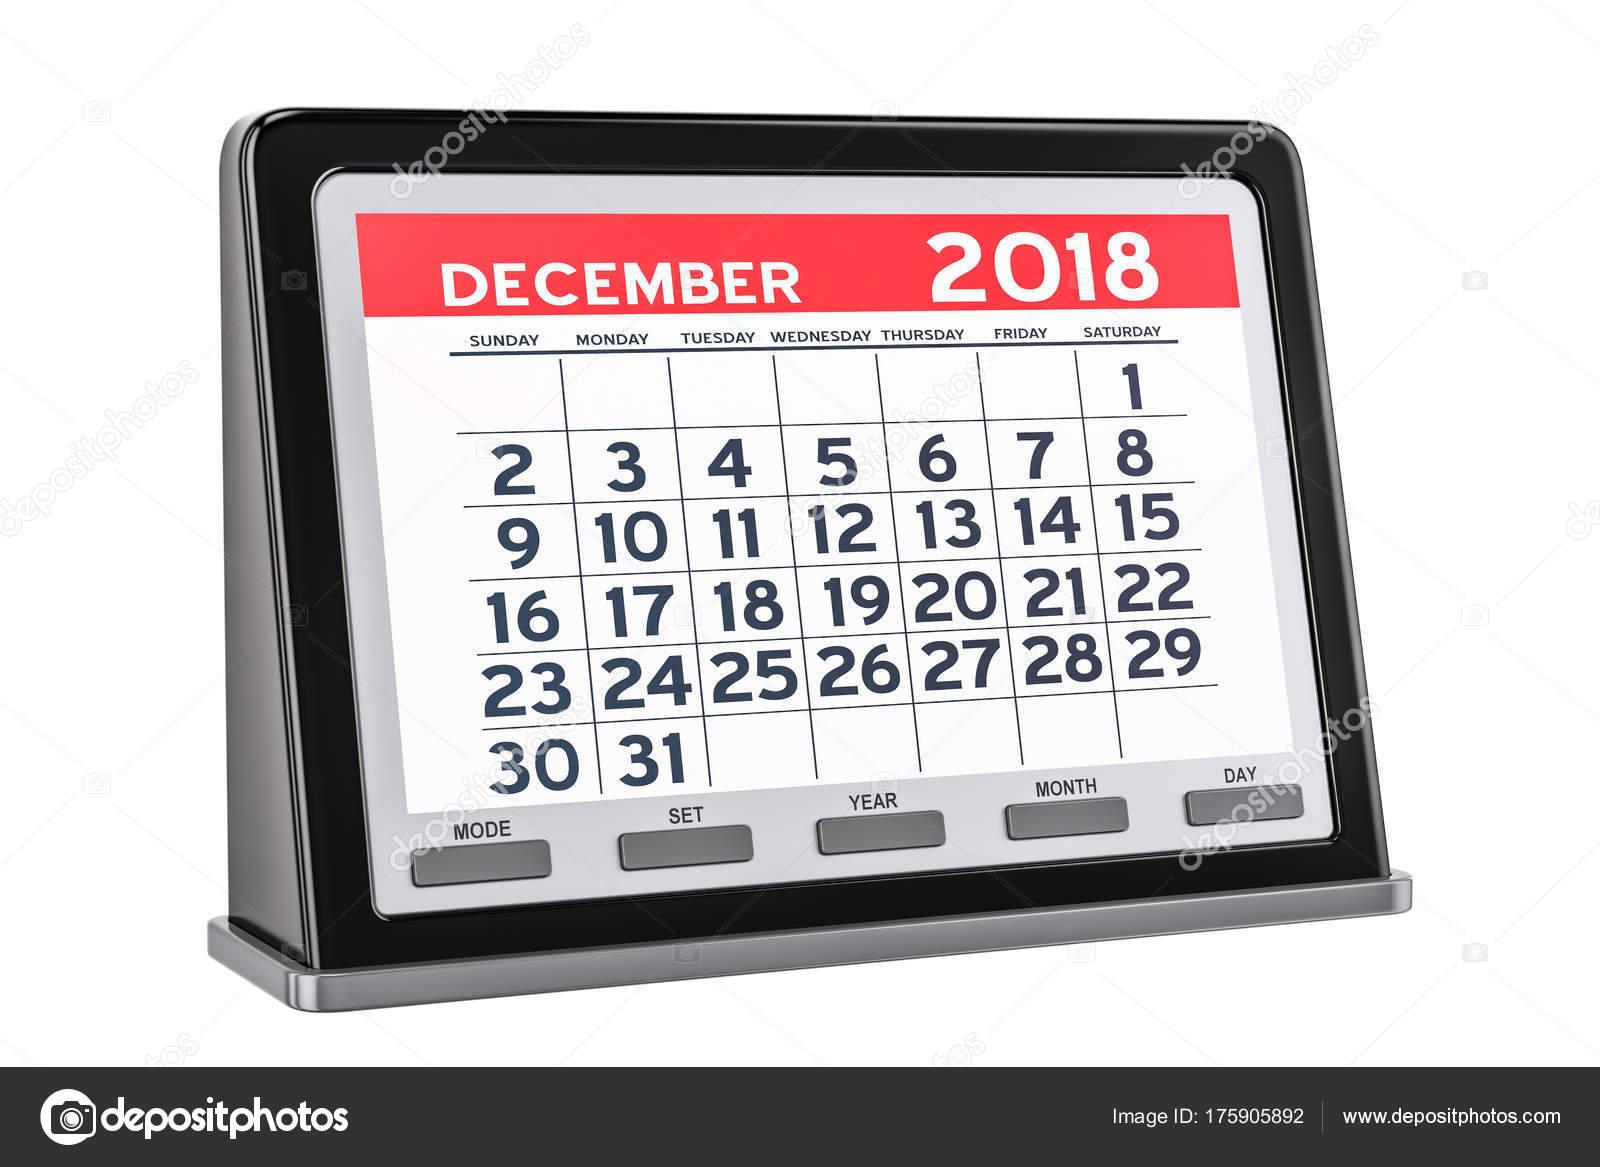 Calendrier Digital.Calendrier Digital Decembre 2018 Rendu 3d Photographie